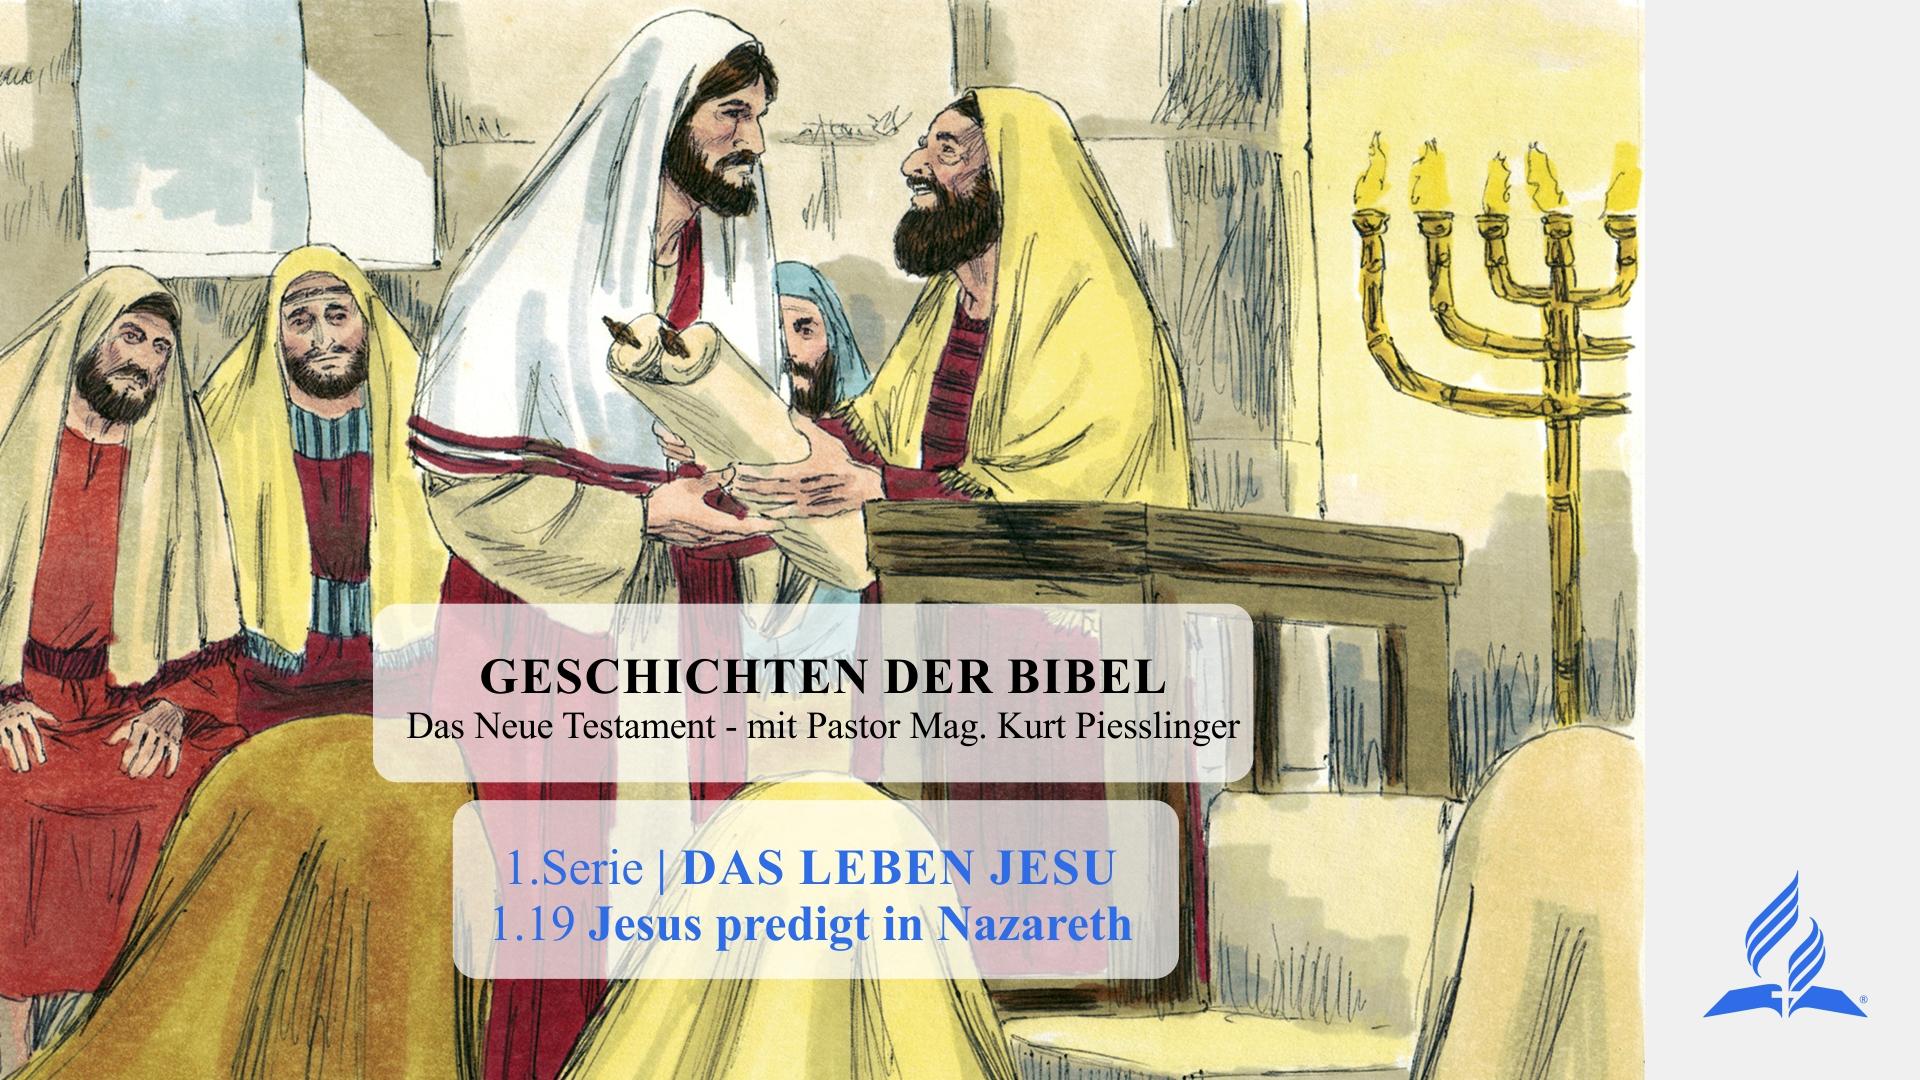 GESCHICHTEN DER BIBEL: 1.19 Jesus predigt in Nazareth – 1.DAS LEBEN JESU | Pastor Mag. Kurt Piesslinger